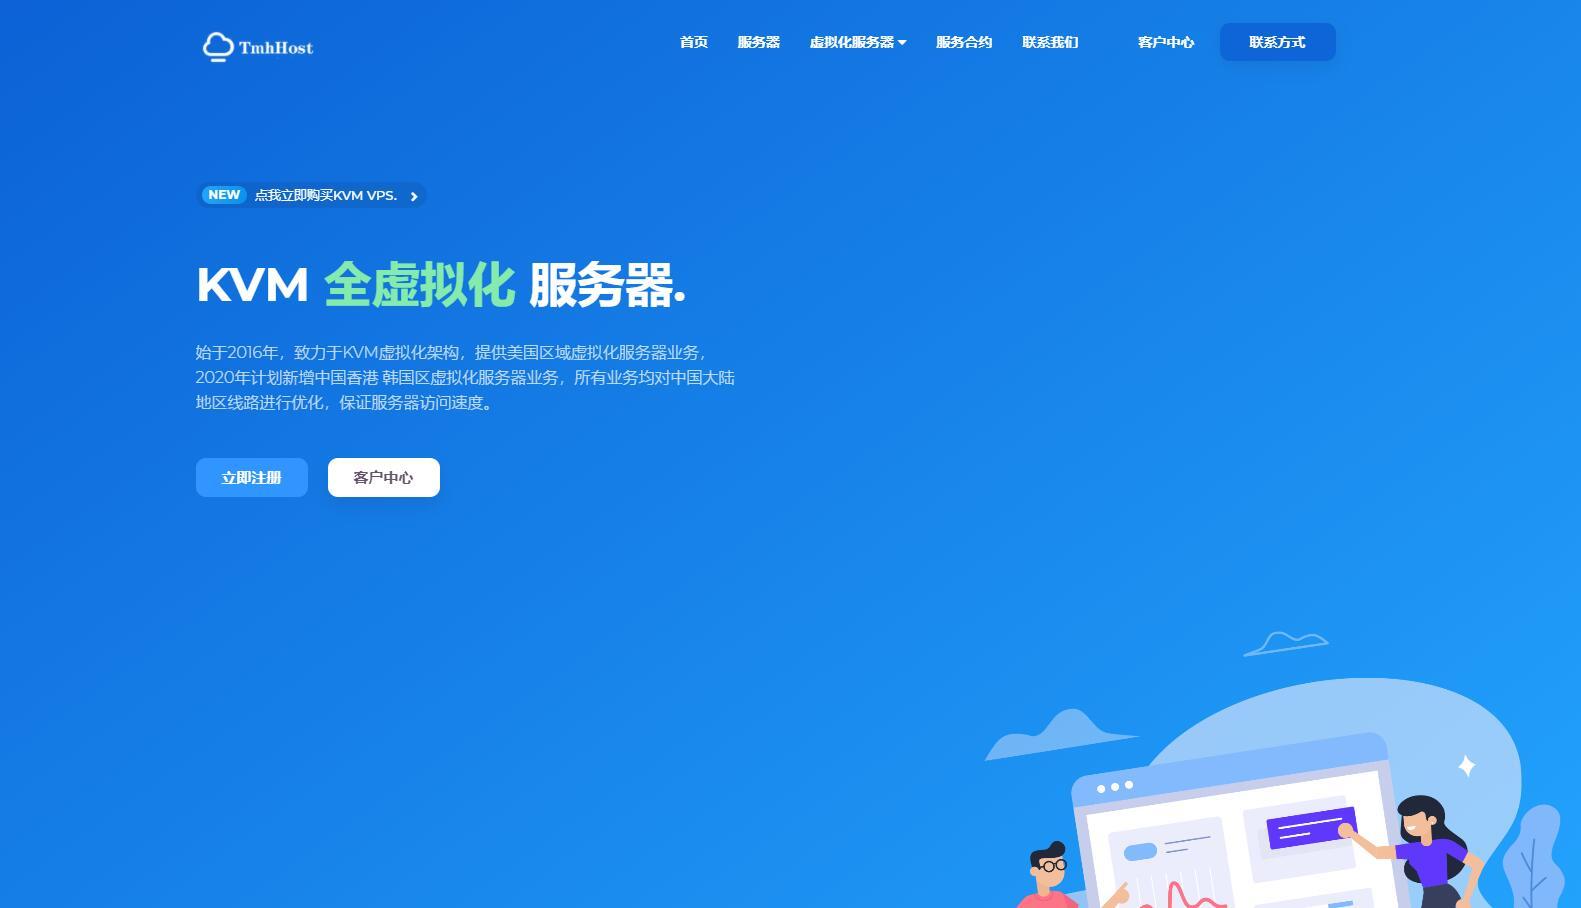 TmhHost 香港VPS测评 - CN2线路无限流量